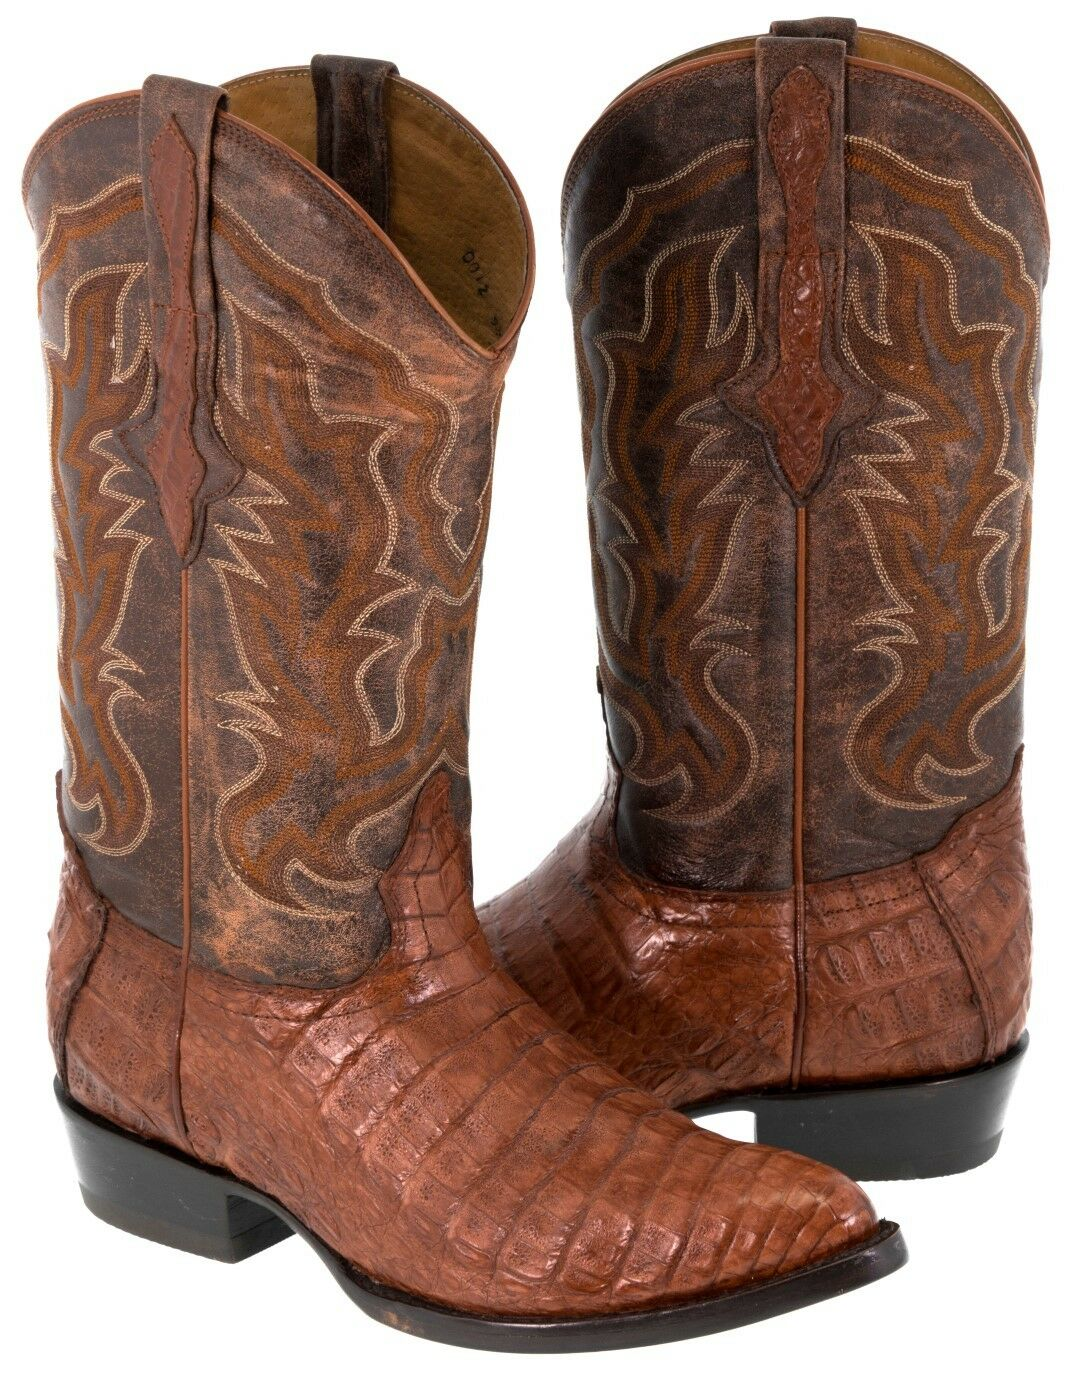 Uomo Cognac Genuine Crocodile Belly Exotic Skin Pelle Cowboy Stivali Pointed Toe